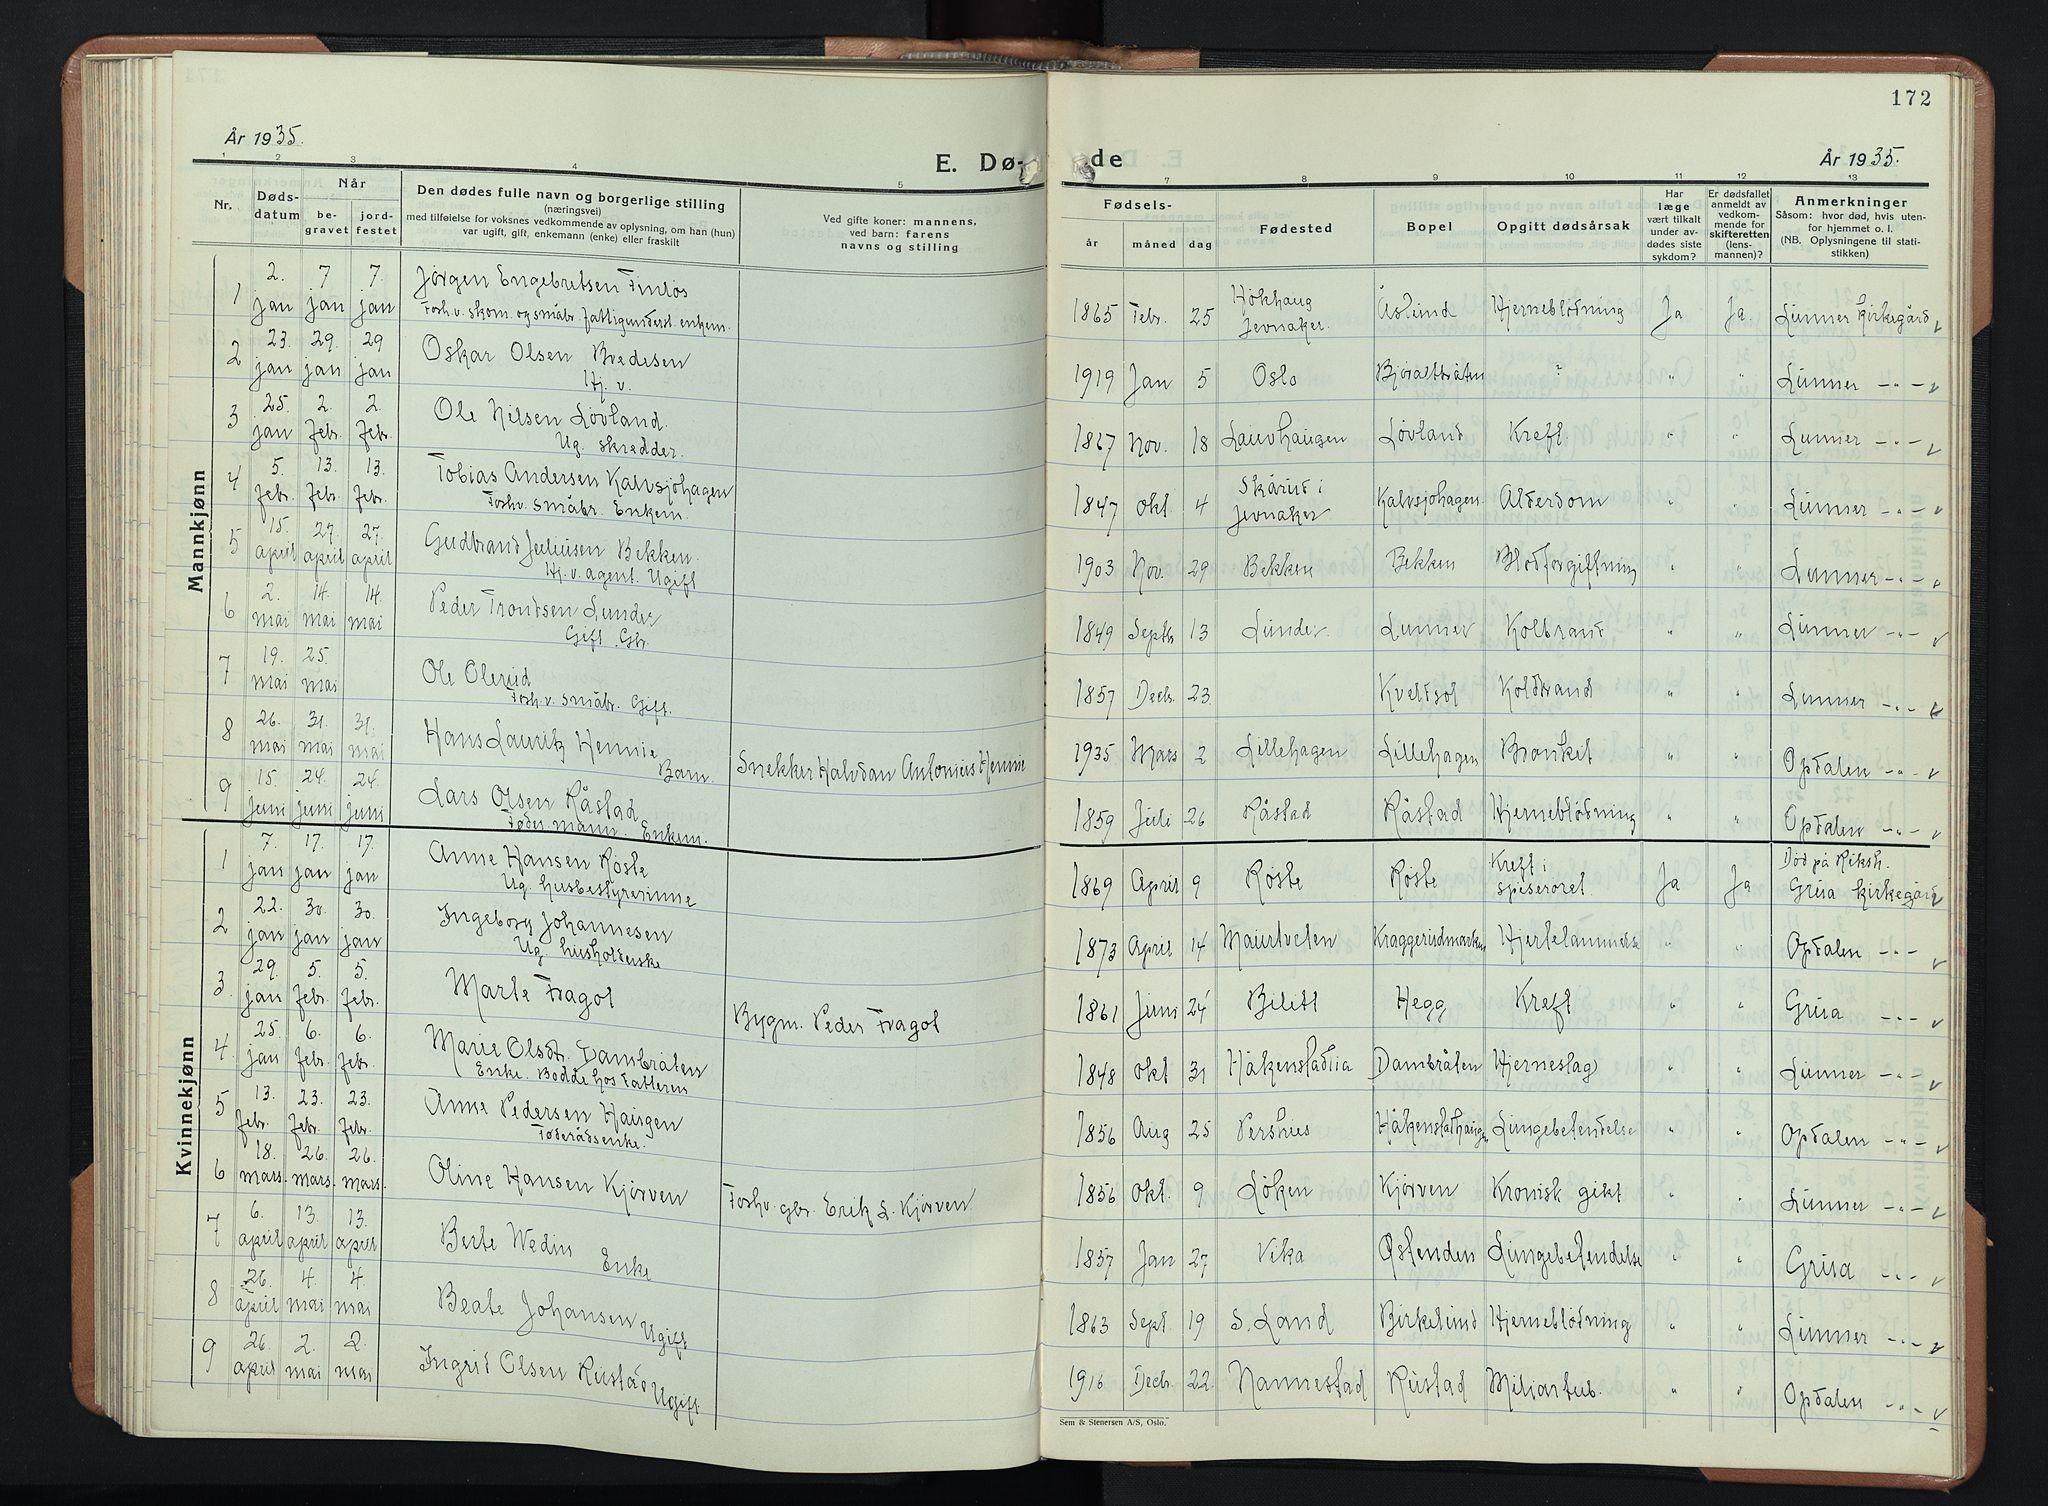 SAH, Lunner prestekontor, H/Ha/Hab/L0003: Klokkerbok nr. 3, 1933-1945, s. 172